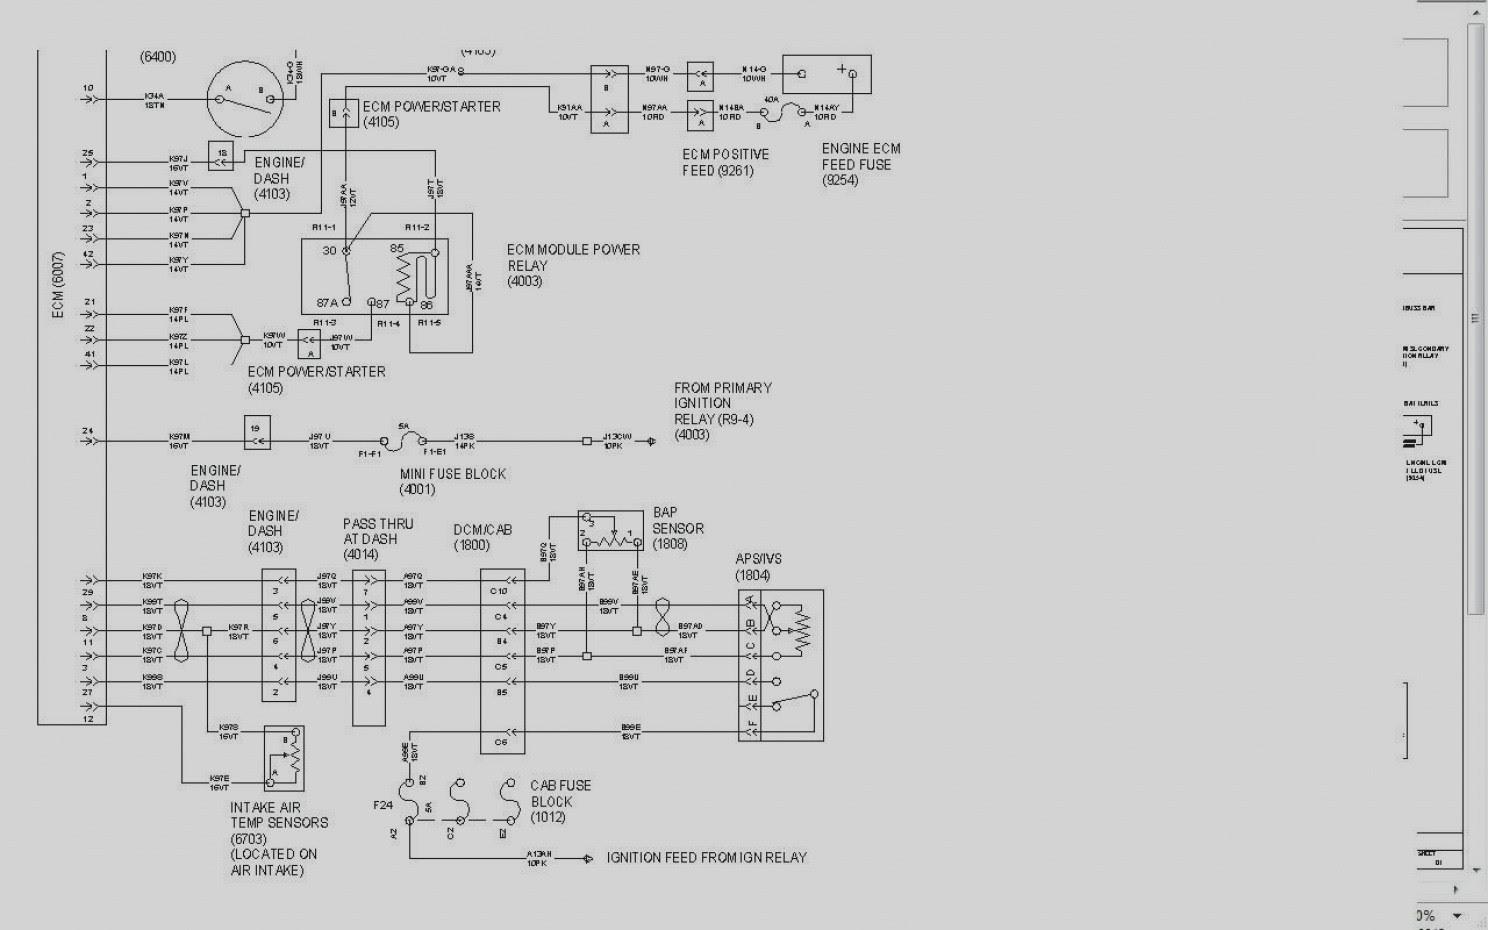 Diagram 2002 International 4300 Starter Wiring Diagram Full Version Hd Quality Wiring Diagram Heartarterydiagram Promoval It